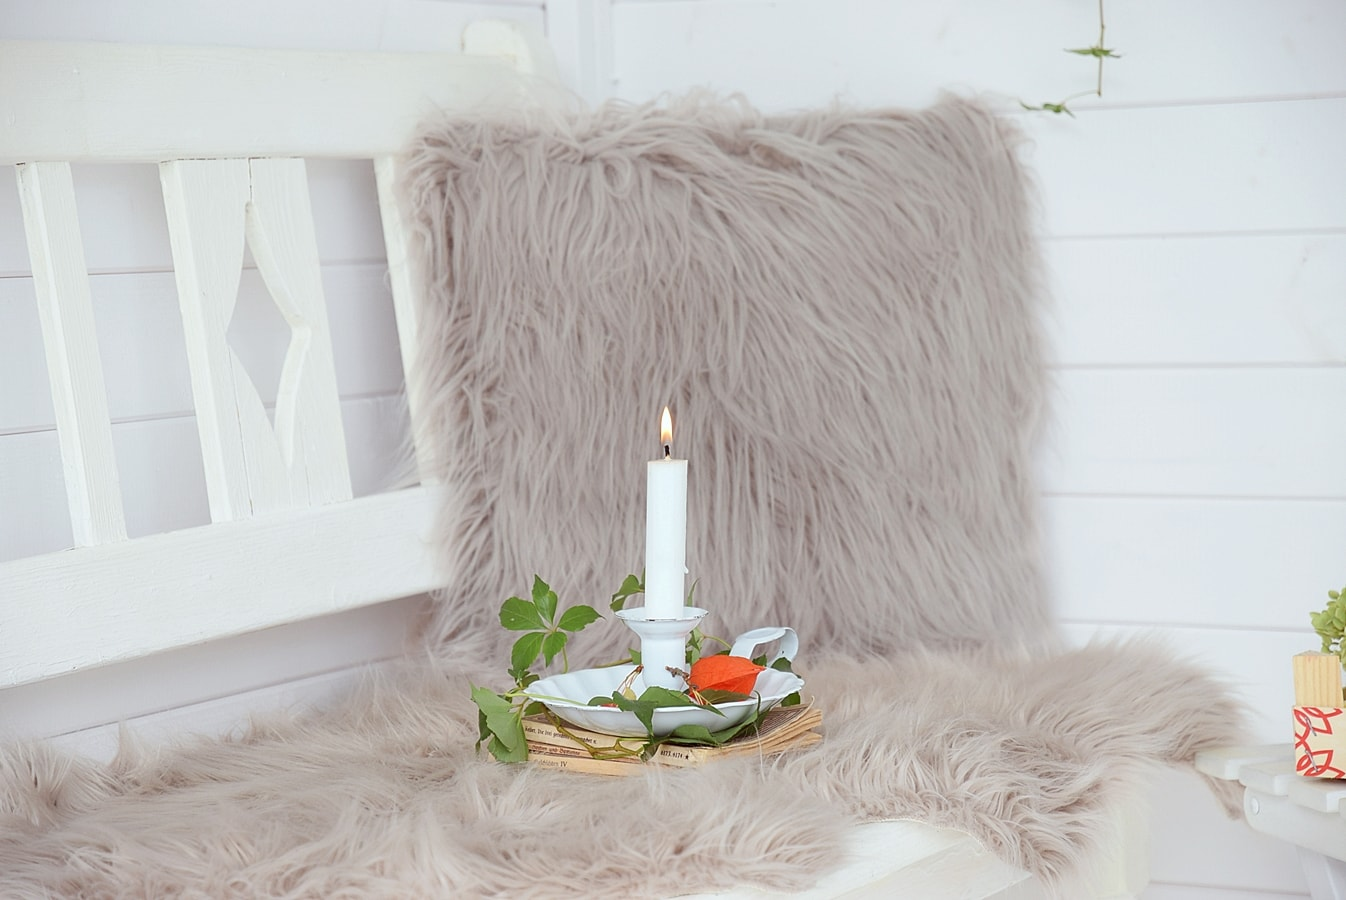 diy herbstlicher wandschmuck selber machen 9k min sch n bei dir by depot. Black Bedroom Furniture Sets. Home Design Ideas